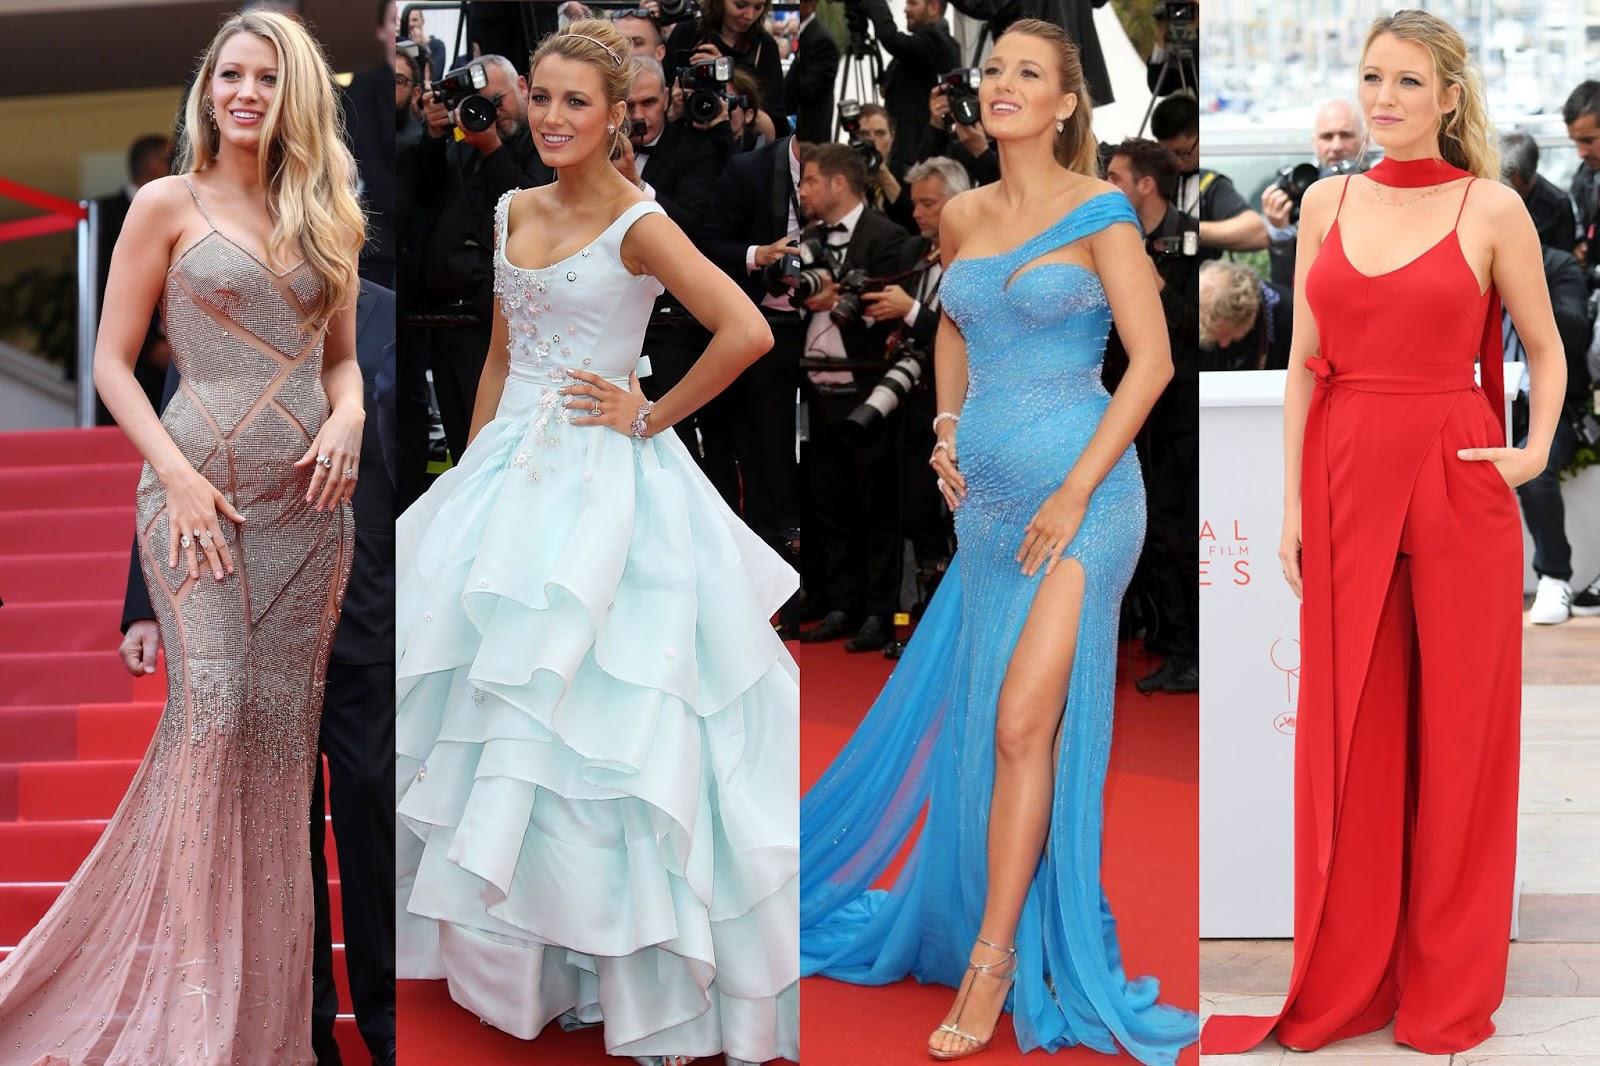 Blake Lively Best Dressed at Cannes Film Festival 2016